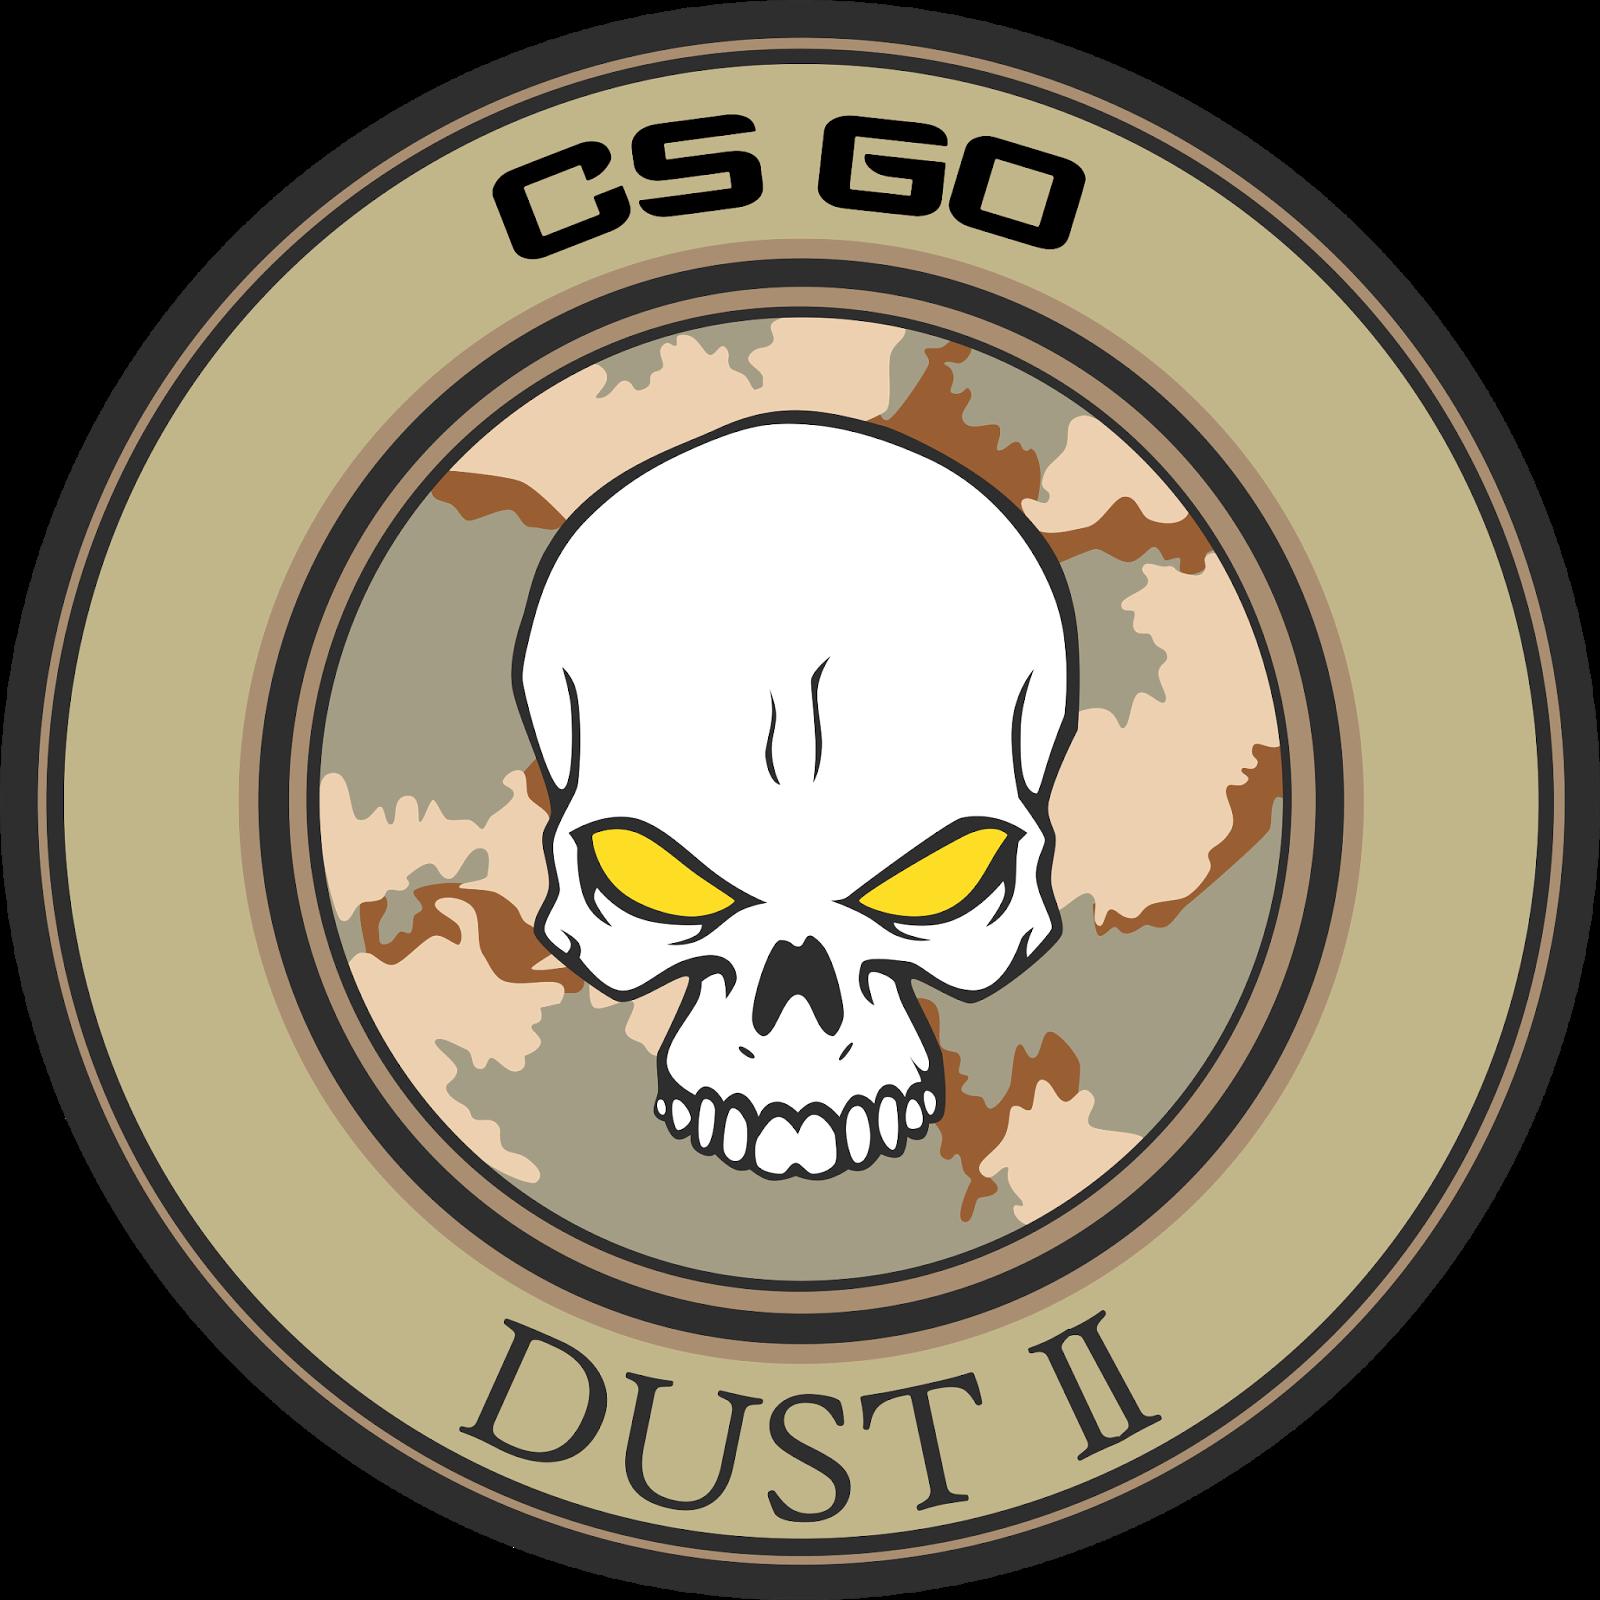 Cs Go Logo – Name